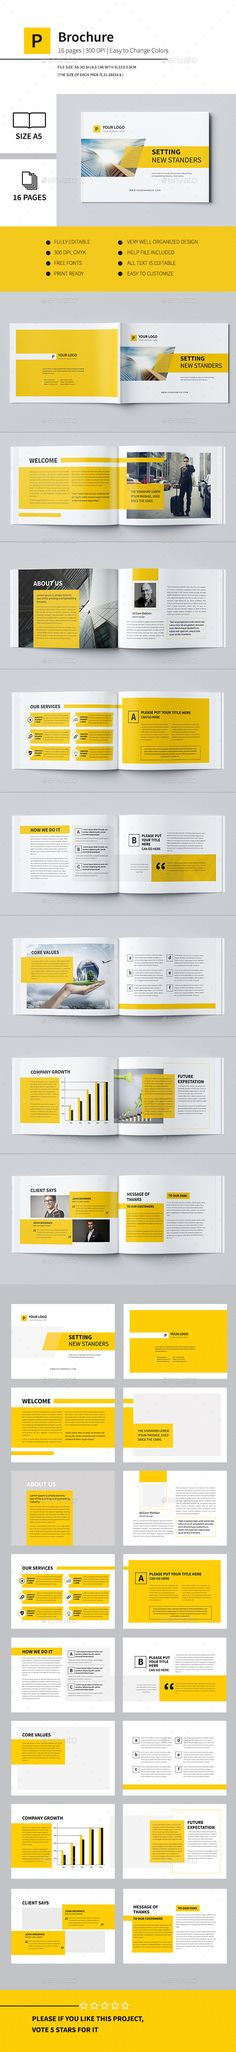 Minimal Business Brochure Template #design Download: http://graphicriver.net/item/minimal-business-brochure-ii/12243729?ref=ksioks